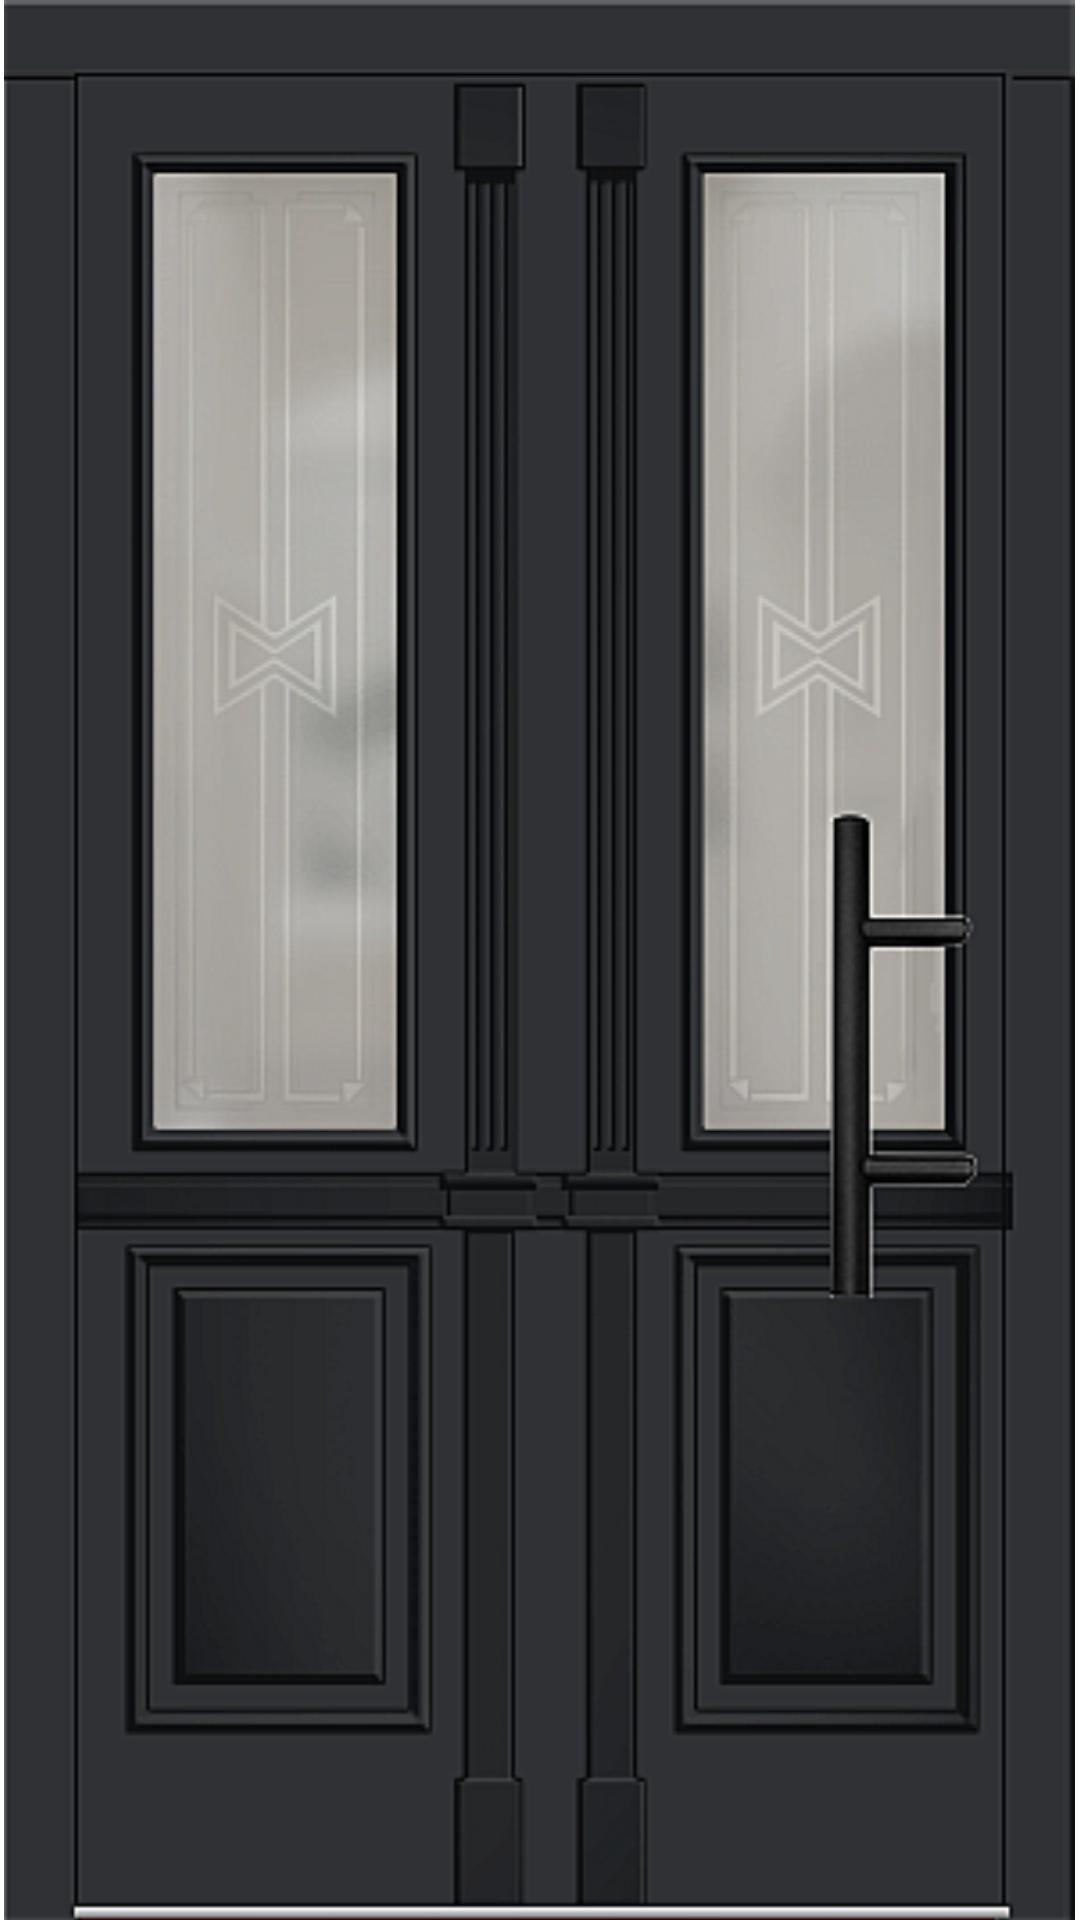 Holz Haustür Modell 7210 schwarz